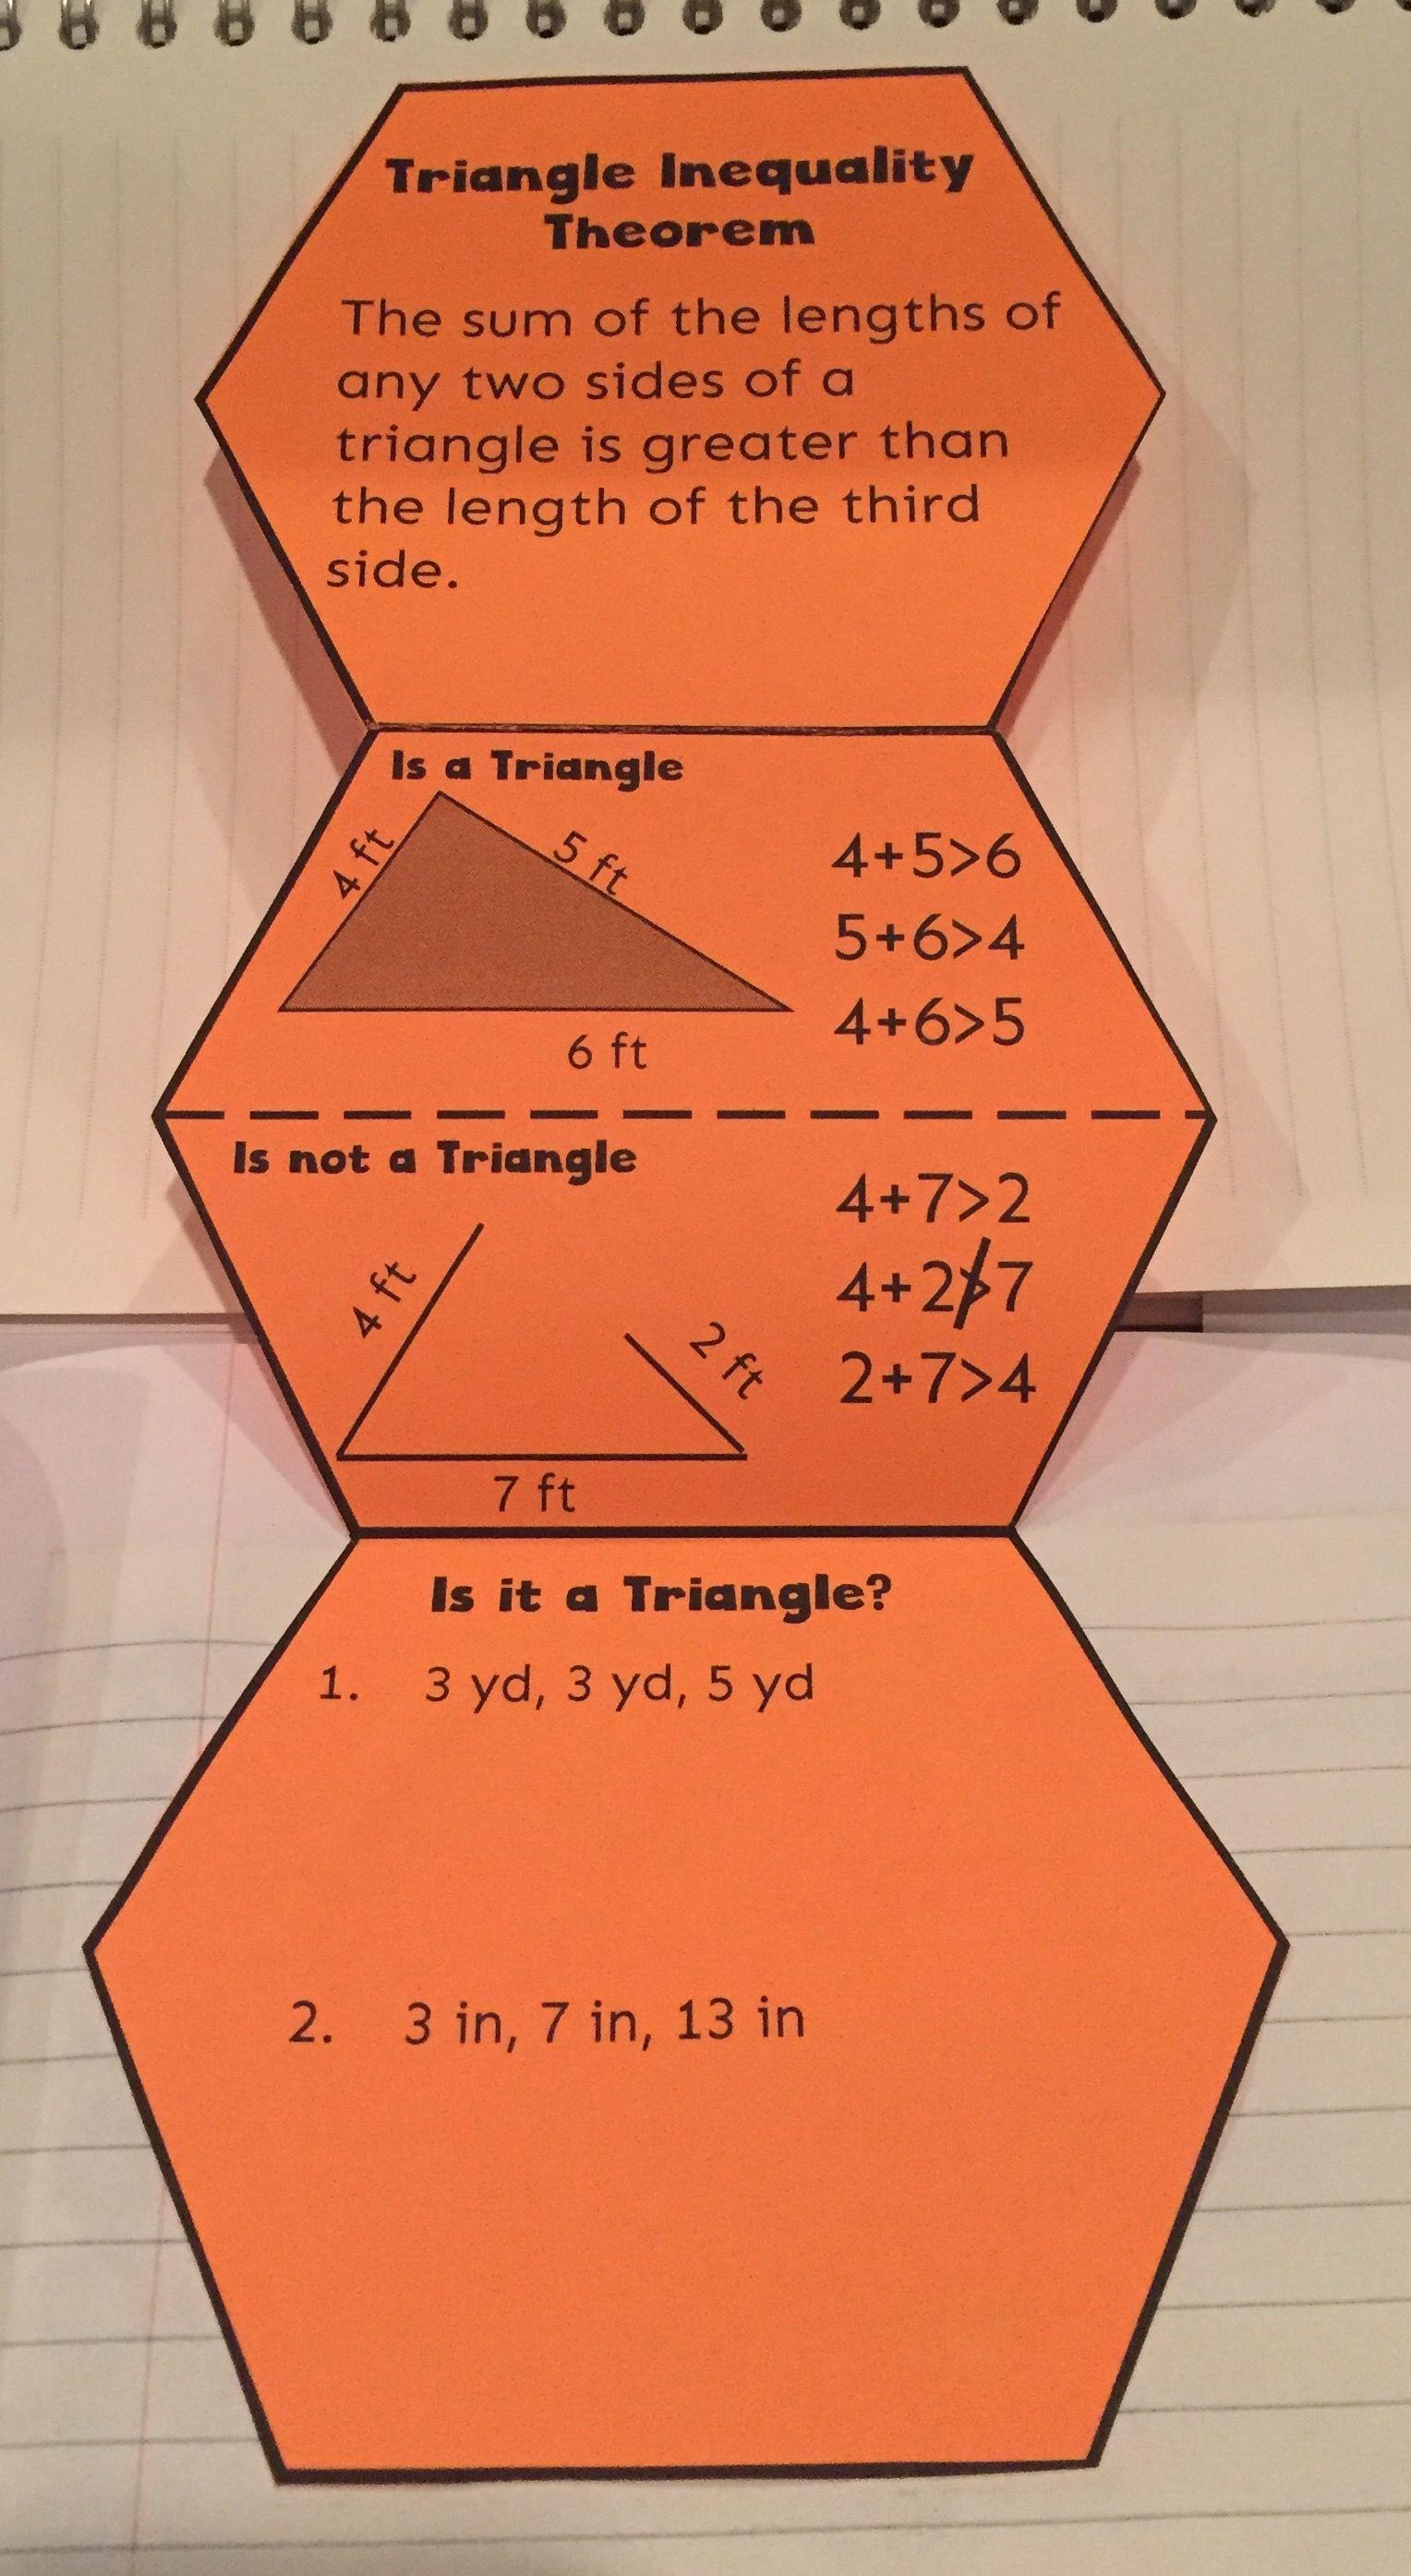 Triangle Inequality Theorem Notes